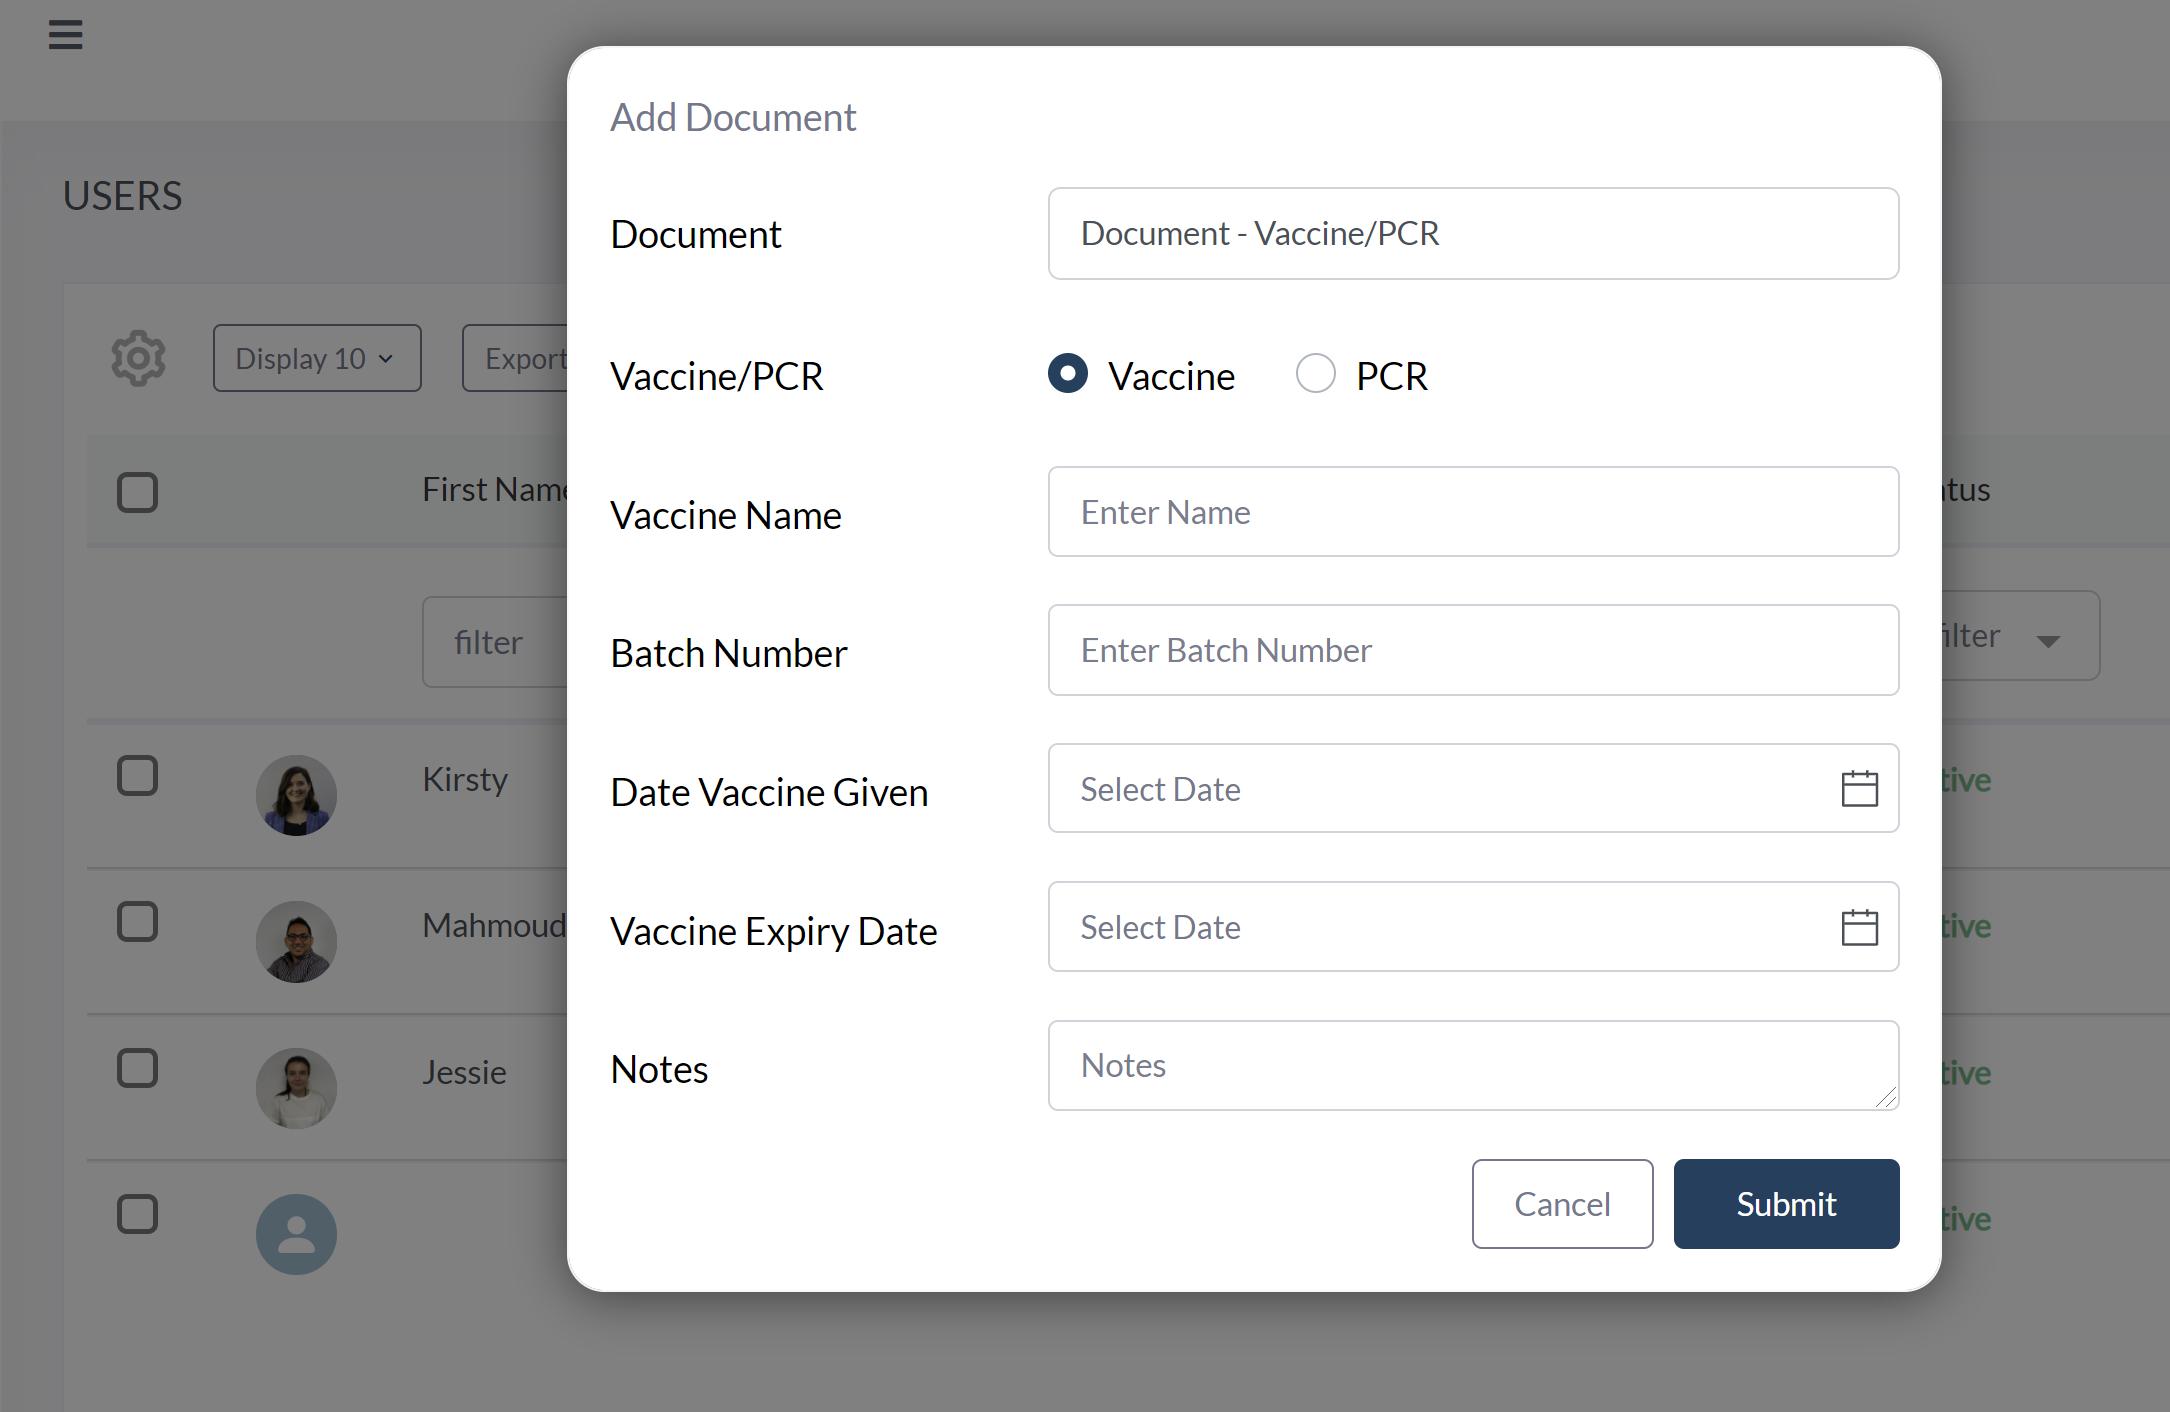 Add Vaccination Record Manually to User Profile